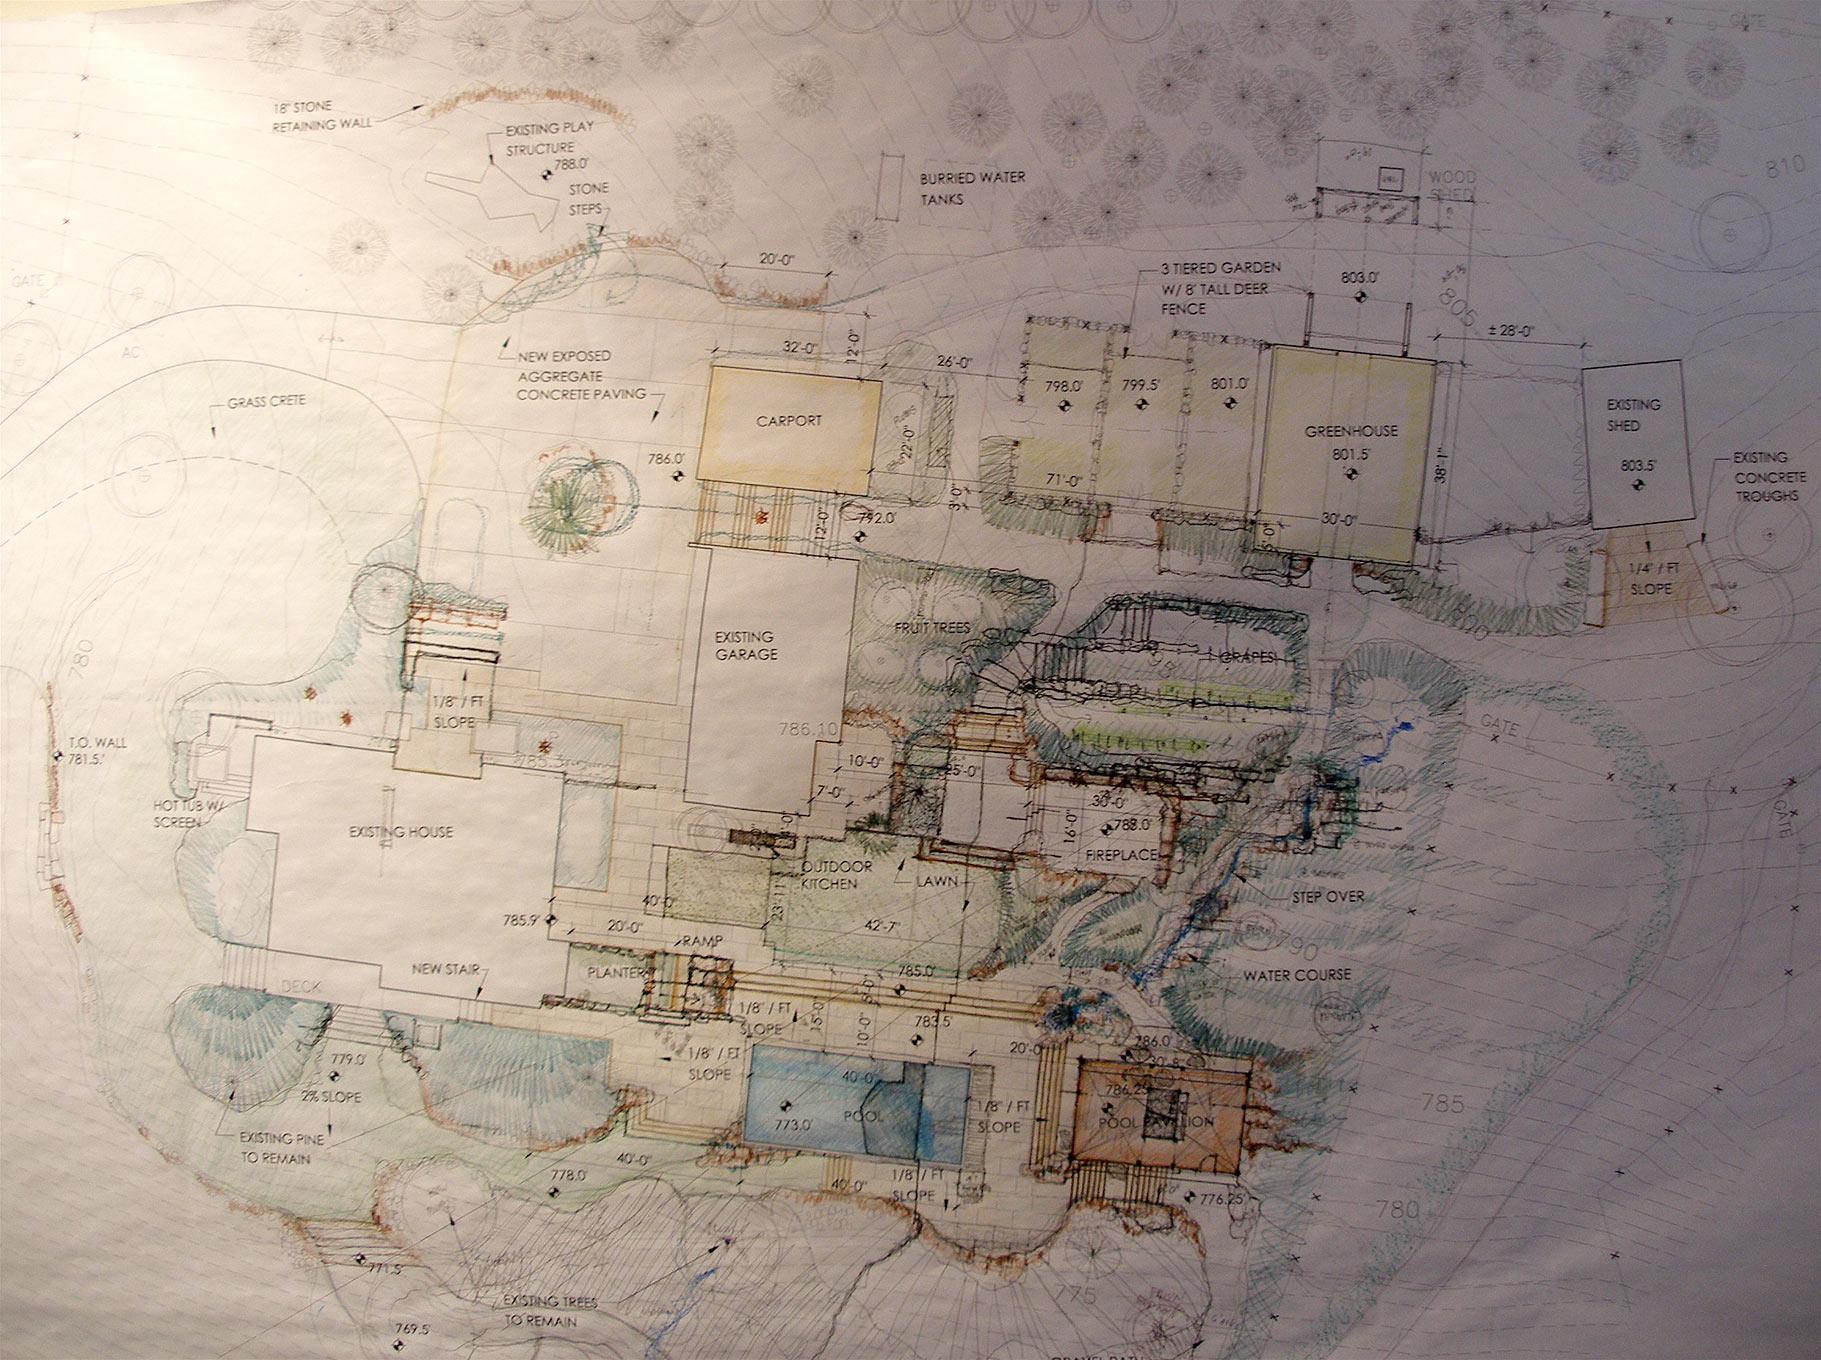 West Wind architectural plans